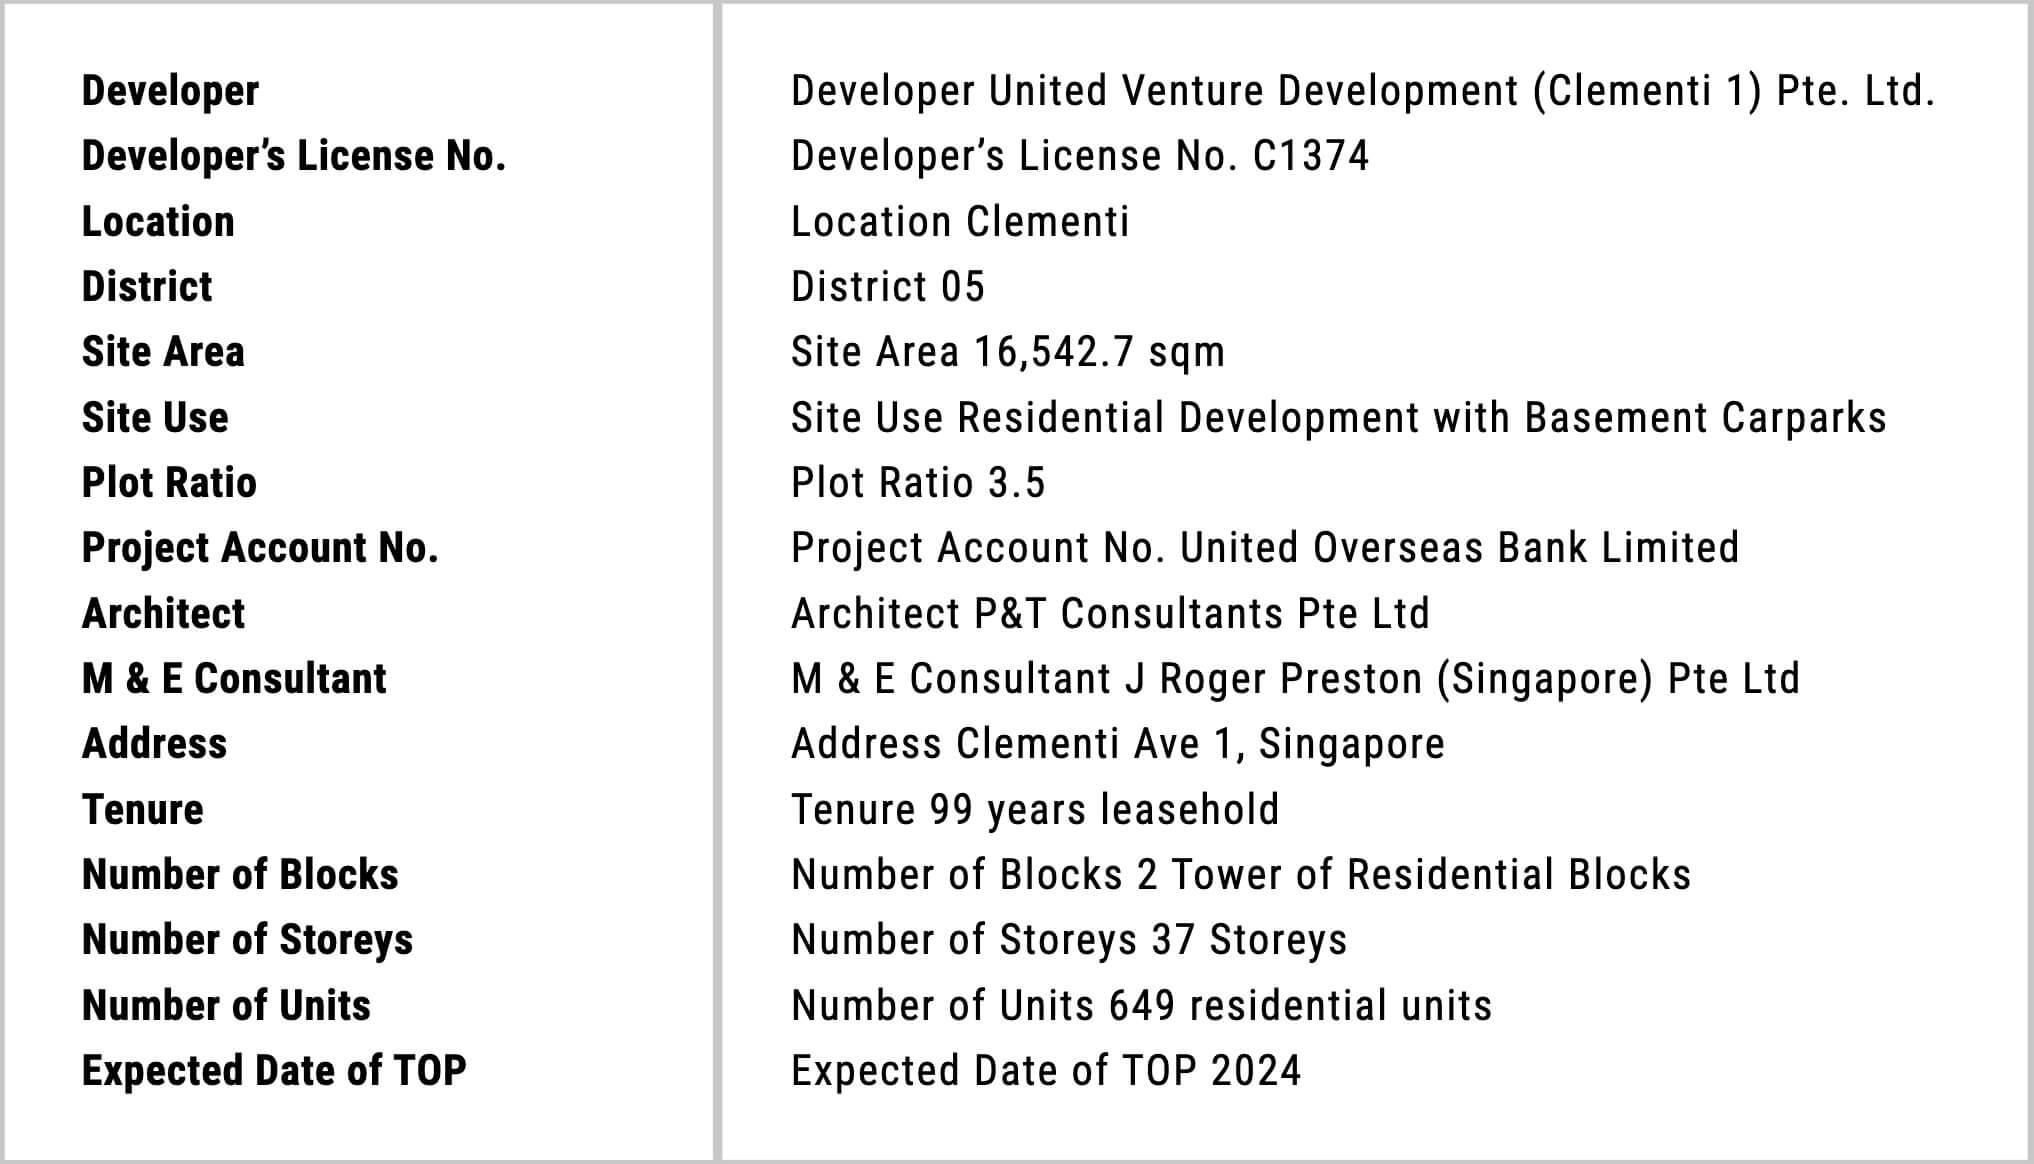 property details such as developer (Developer United Venture Development (Clementi 1) Pte. Ltd, developer's license no.